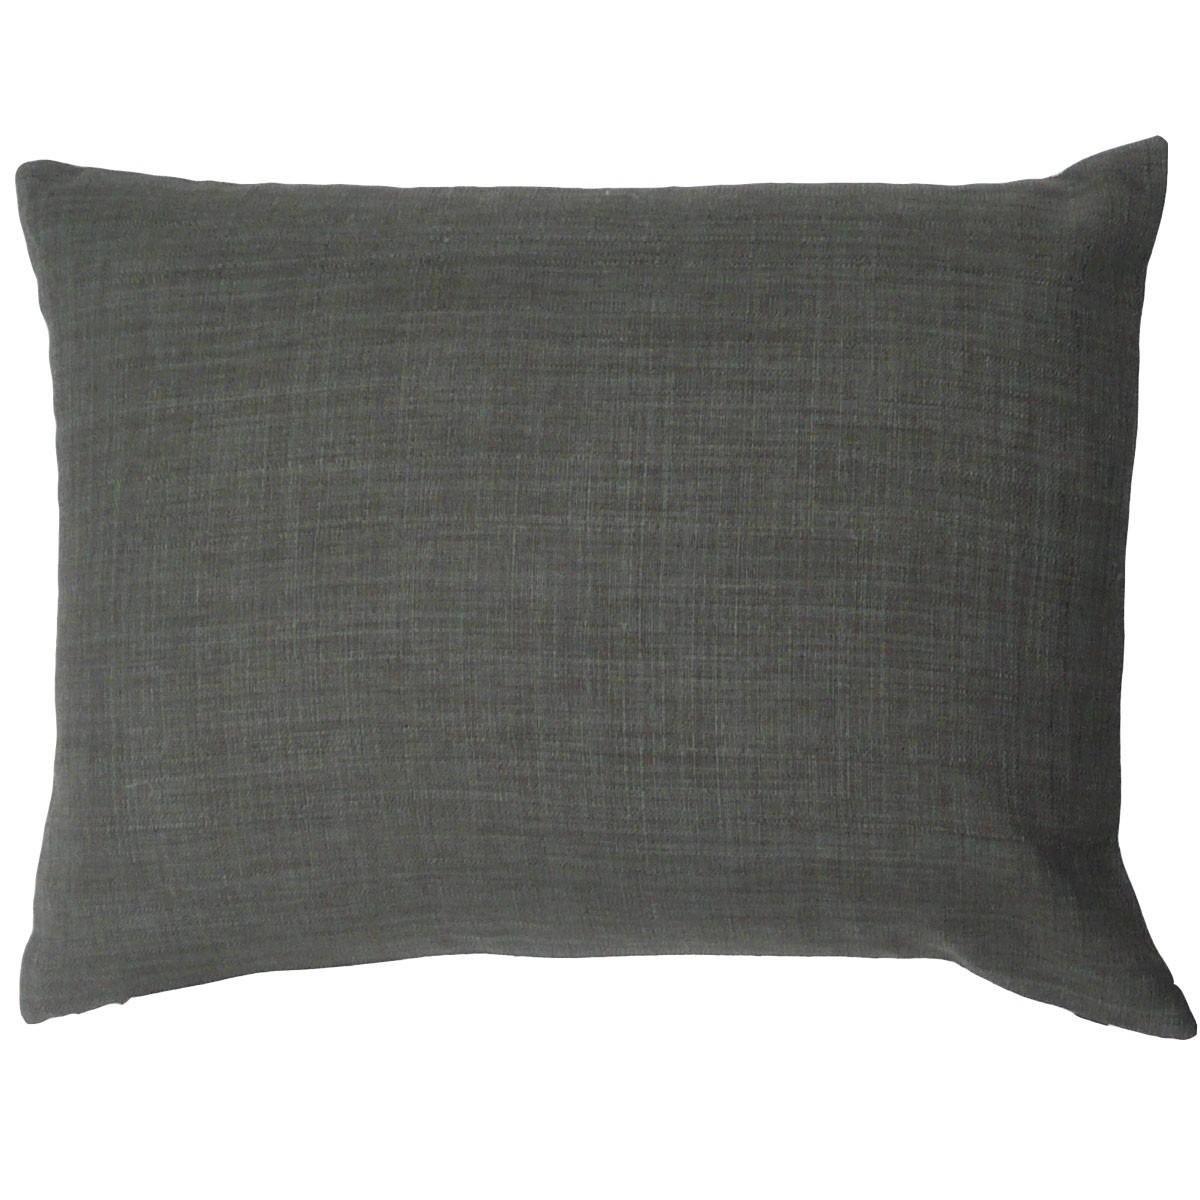 kissen dekokissen dandelion pusteblume schwarz wei 40x30cm ebay. Black Bedroom Furniture Sets. Home Design Ideas